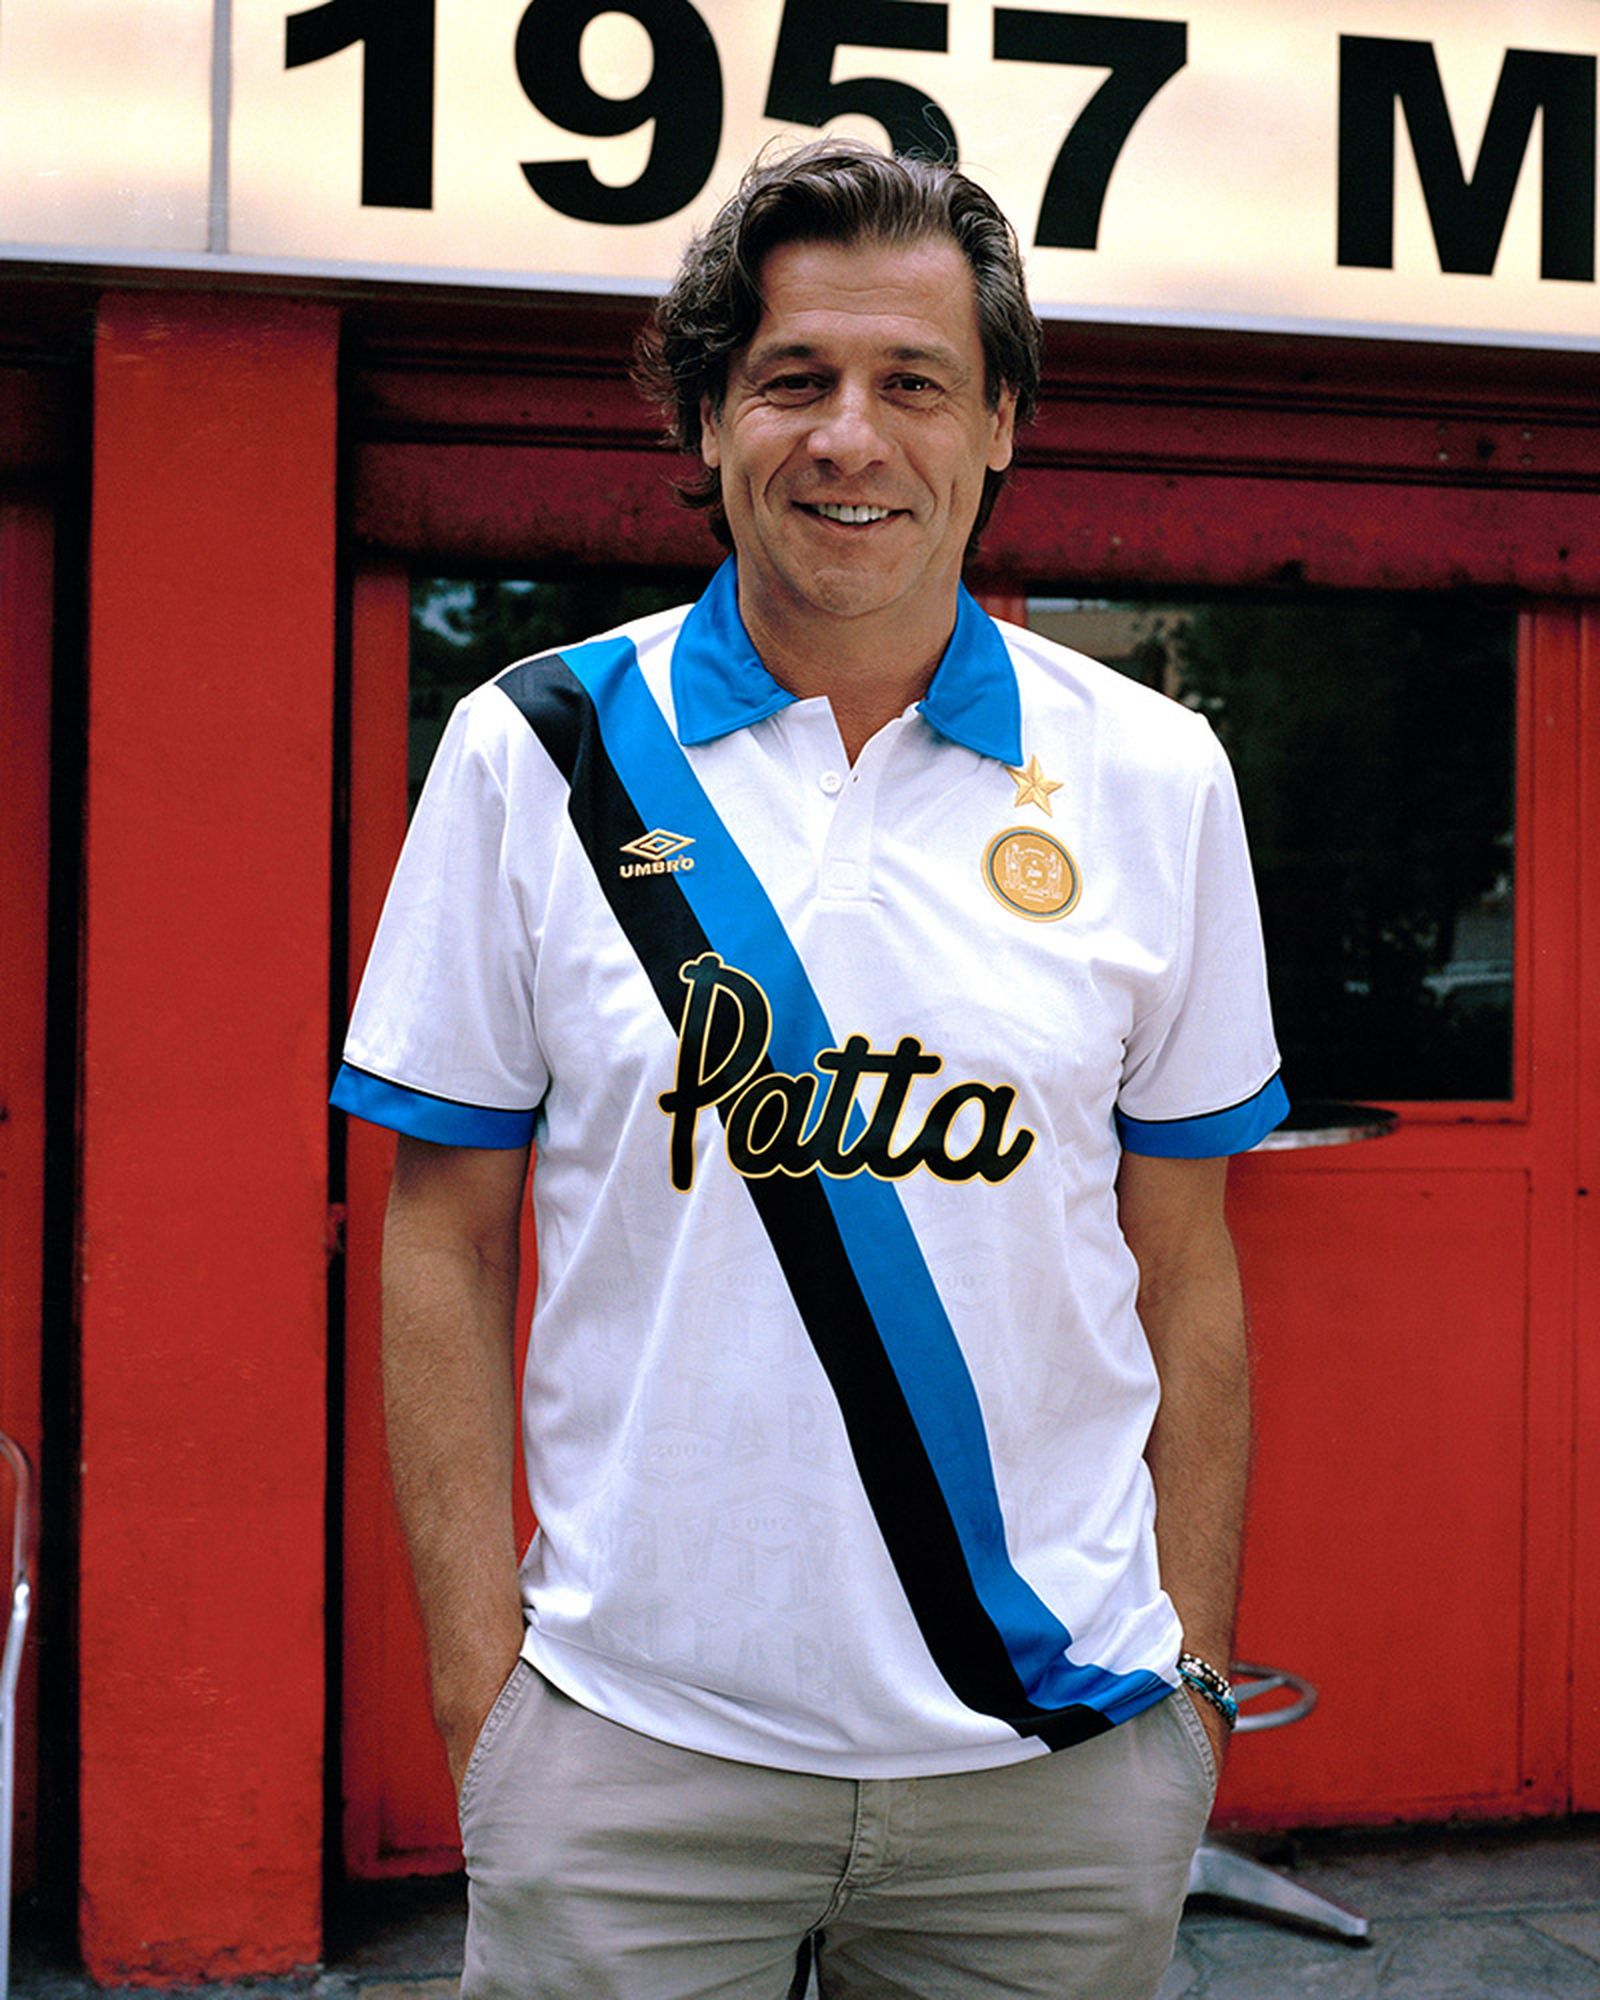 patta-umbro-inter-away-jersey-release-date-price-02